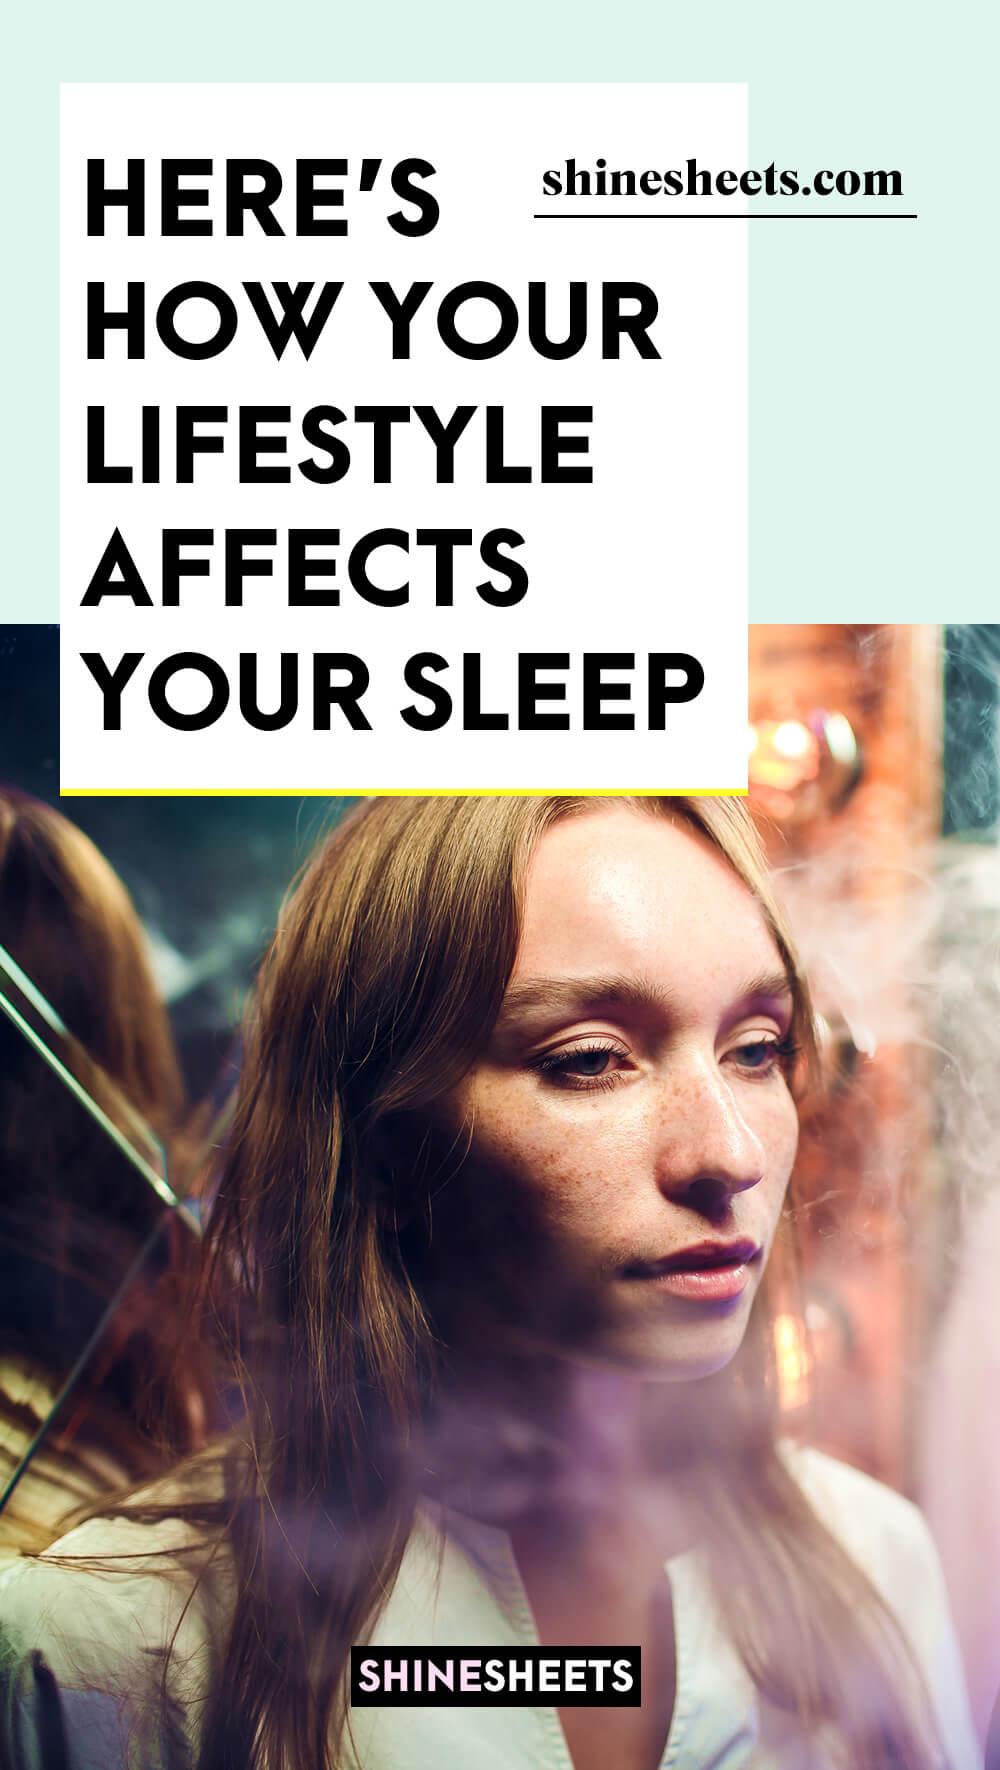 woman smoking electronic cigarette despite affected sleep